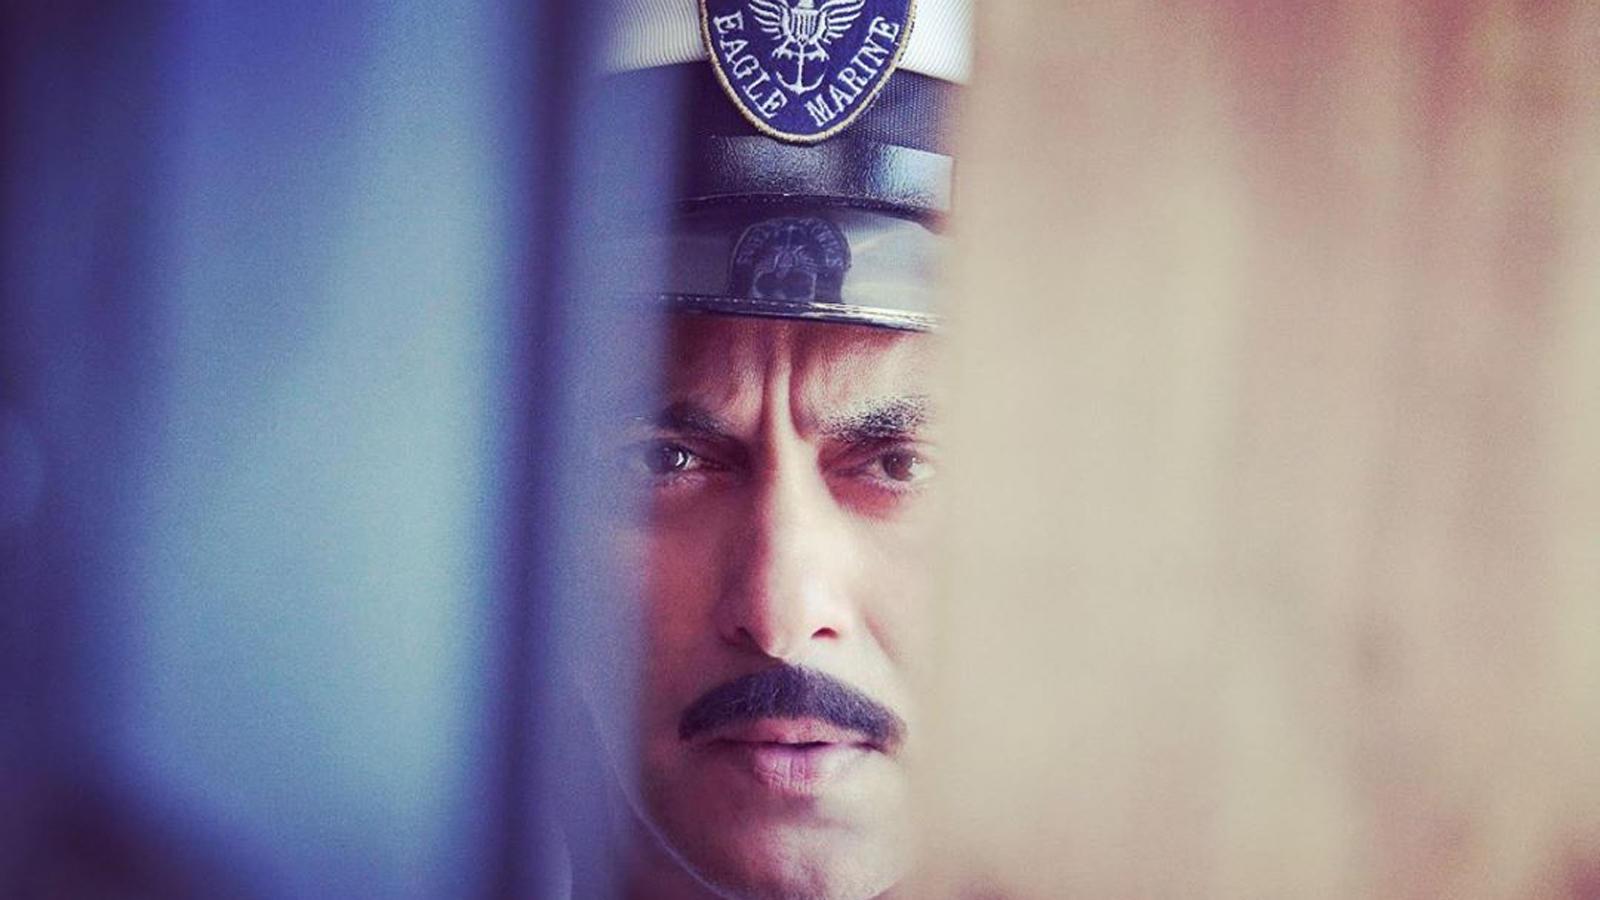 Ali Abbas Zafar shares unseen picture of Salman Khan from 'Bharat'